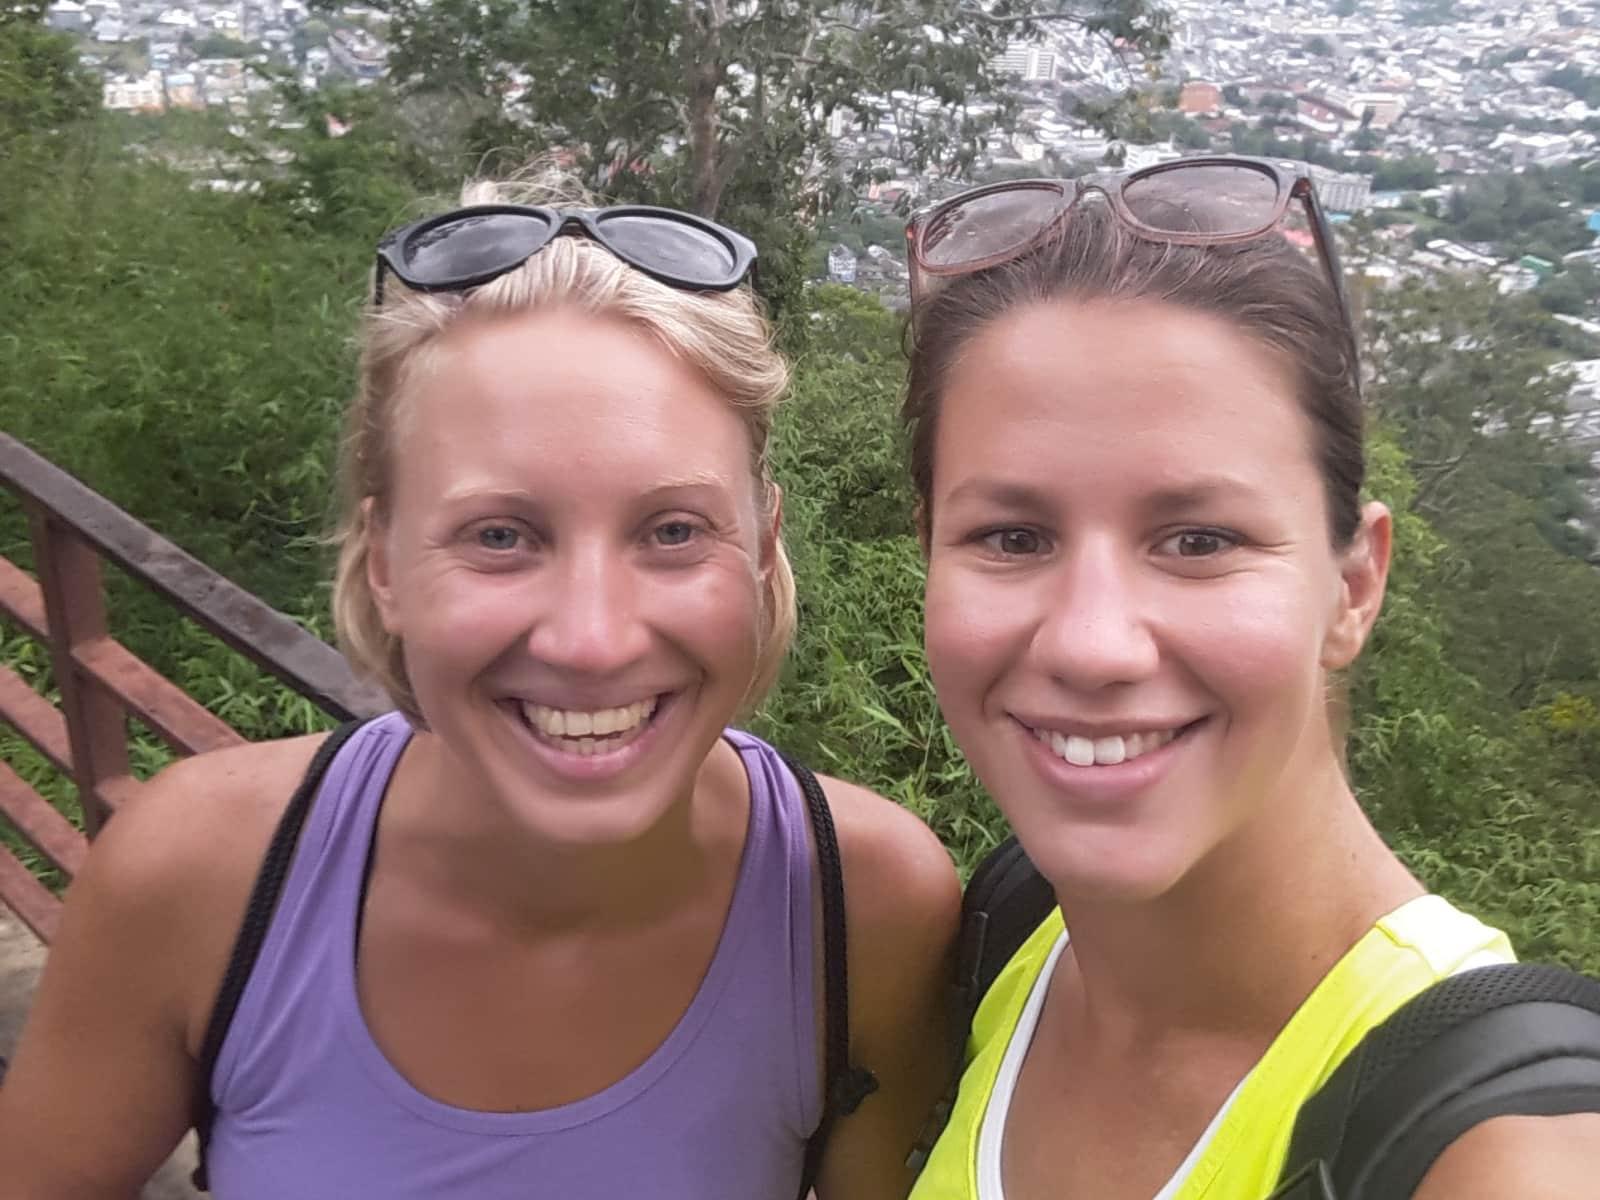 Reka dora & Dora from Budapest, Hungary